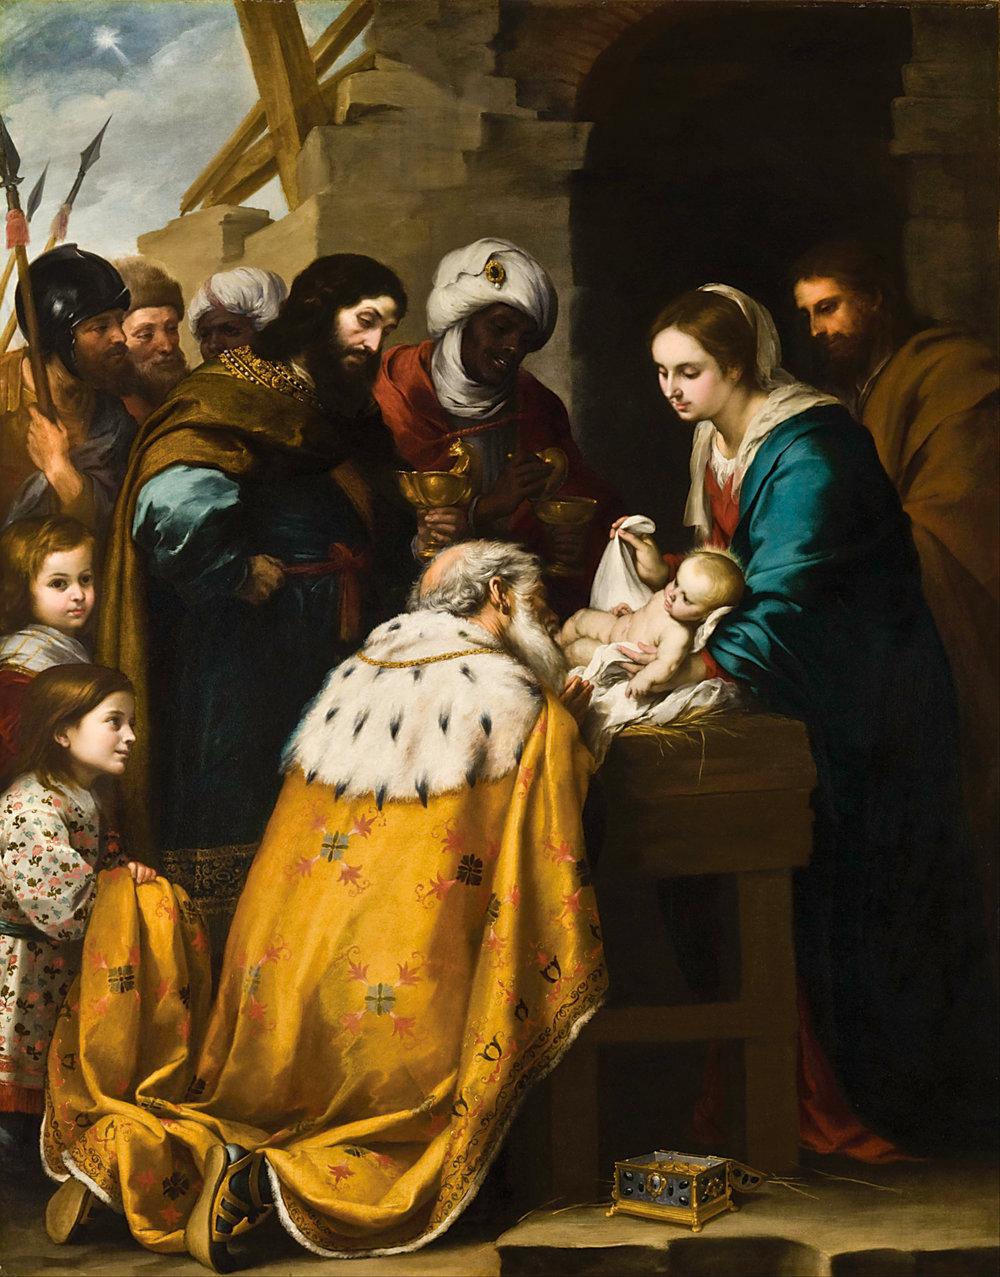 103 OB 13 Bartolomé_Esteban_Murillo_-_Adoration_of_the_Magi_-_Google_Art_Project.jpg